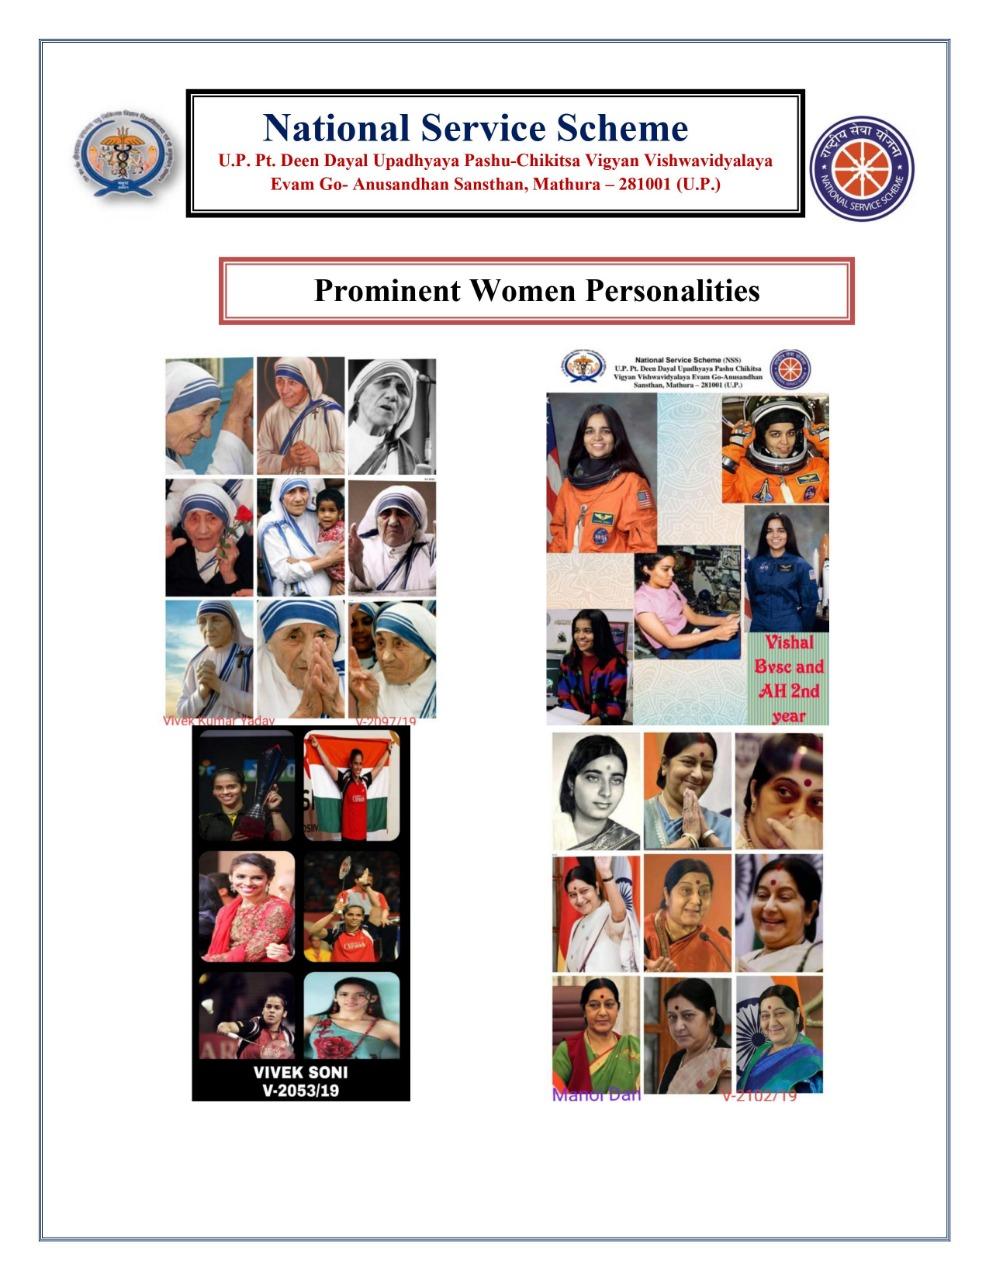 international-womens-day-activities-by-nss-duvasu